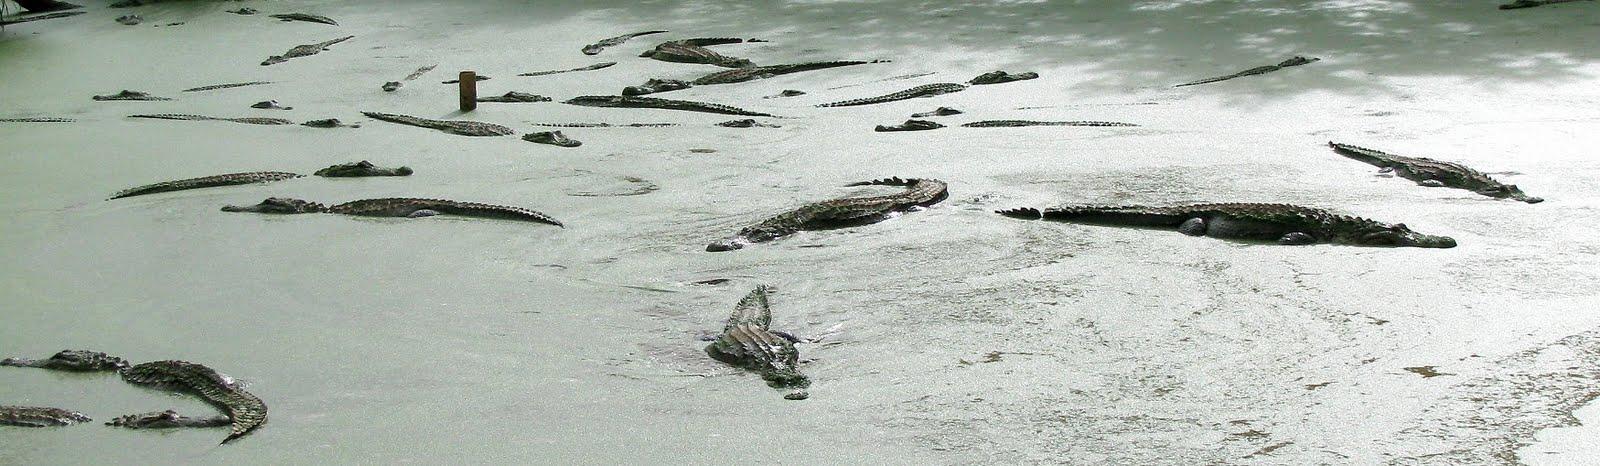 alligator soup - photo #33